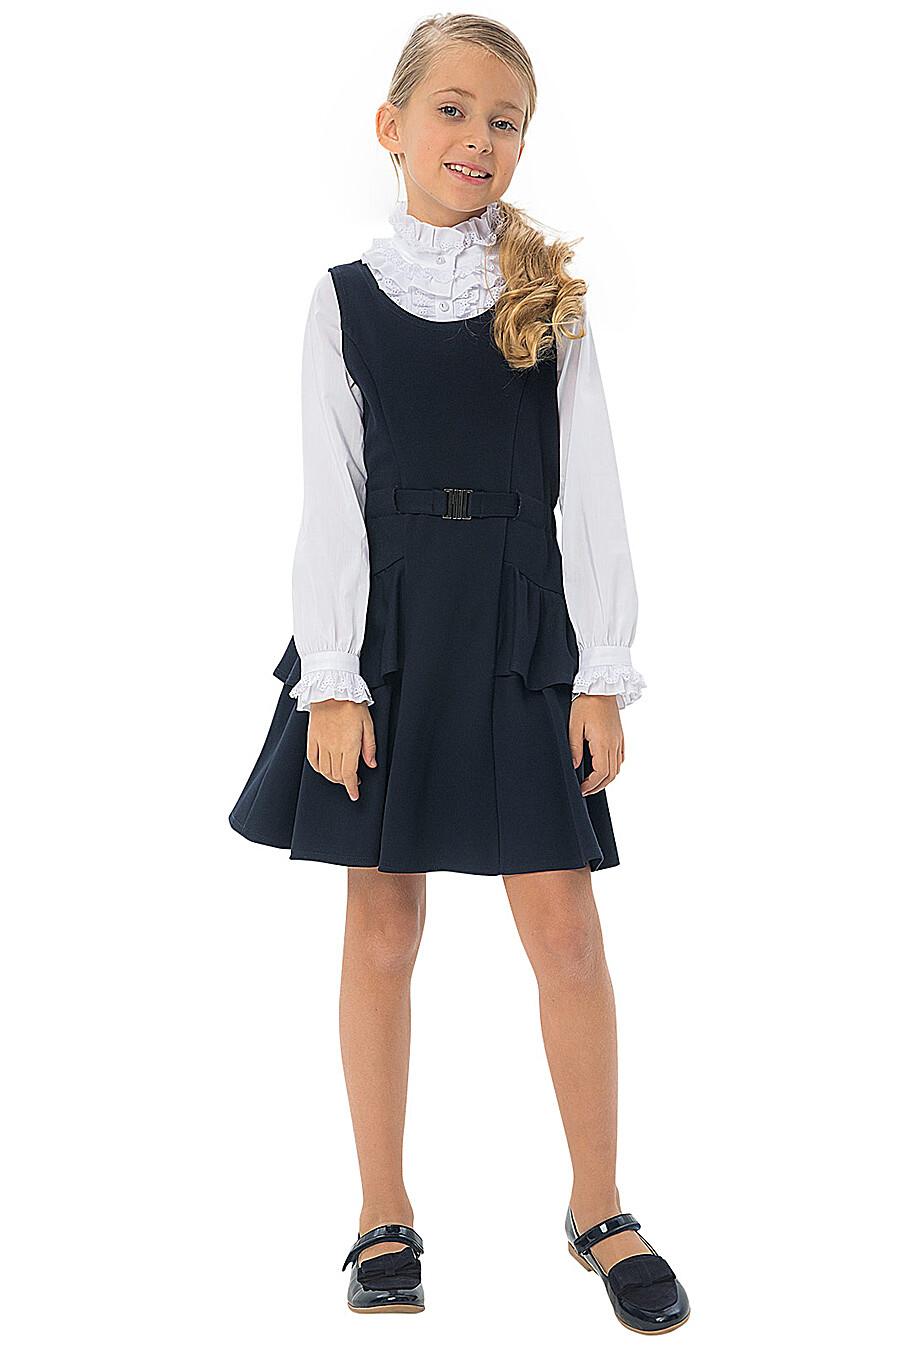 Сарафан КАРАМЕЛЛИ (683296), купить в Moyo.moda